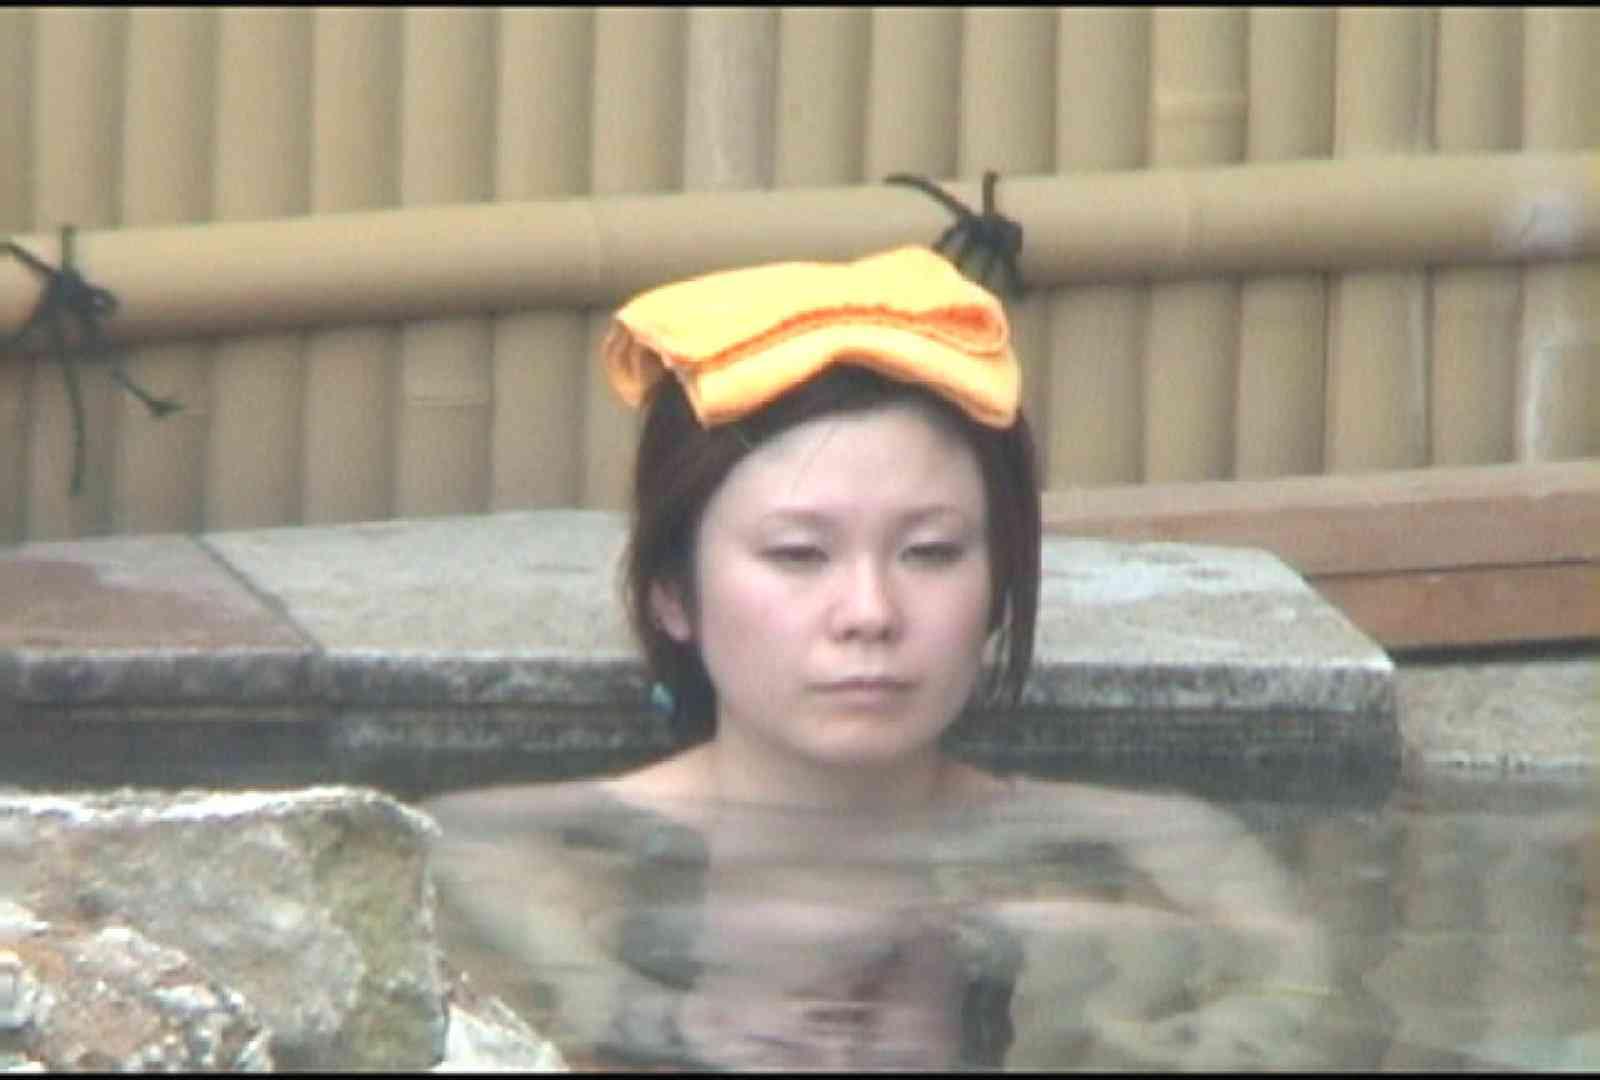 Aquaな露天風呂Vol.177 盗撮師作品  102pic 84